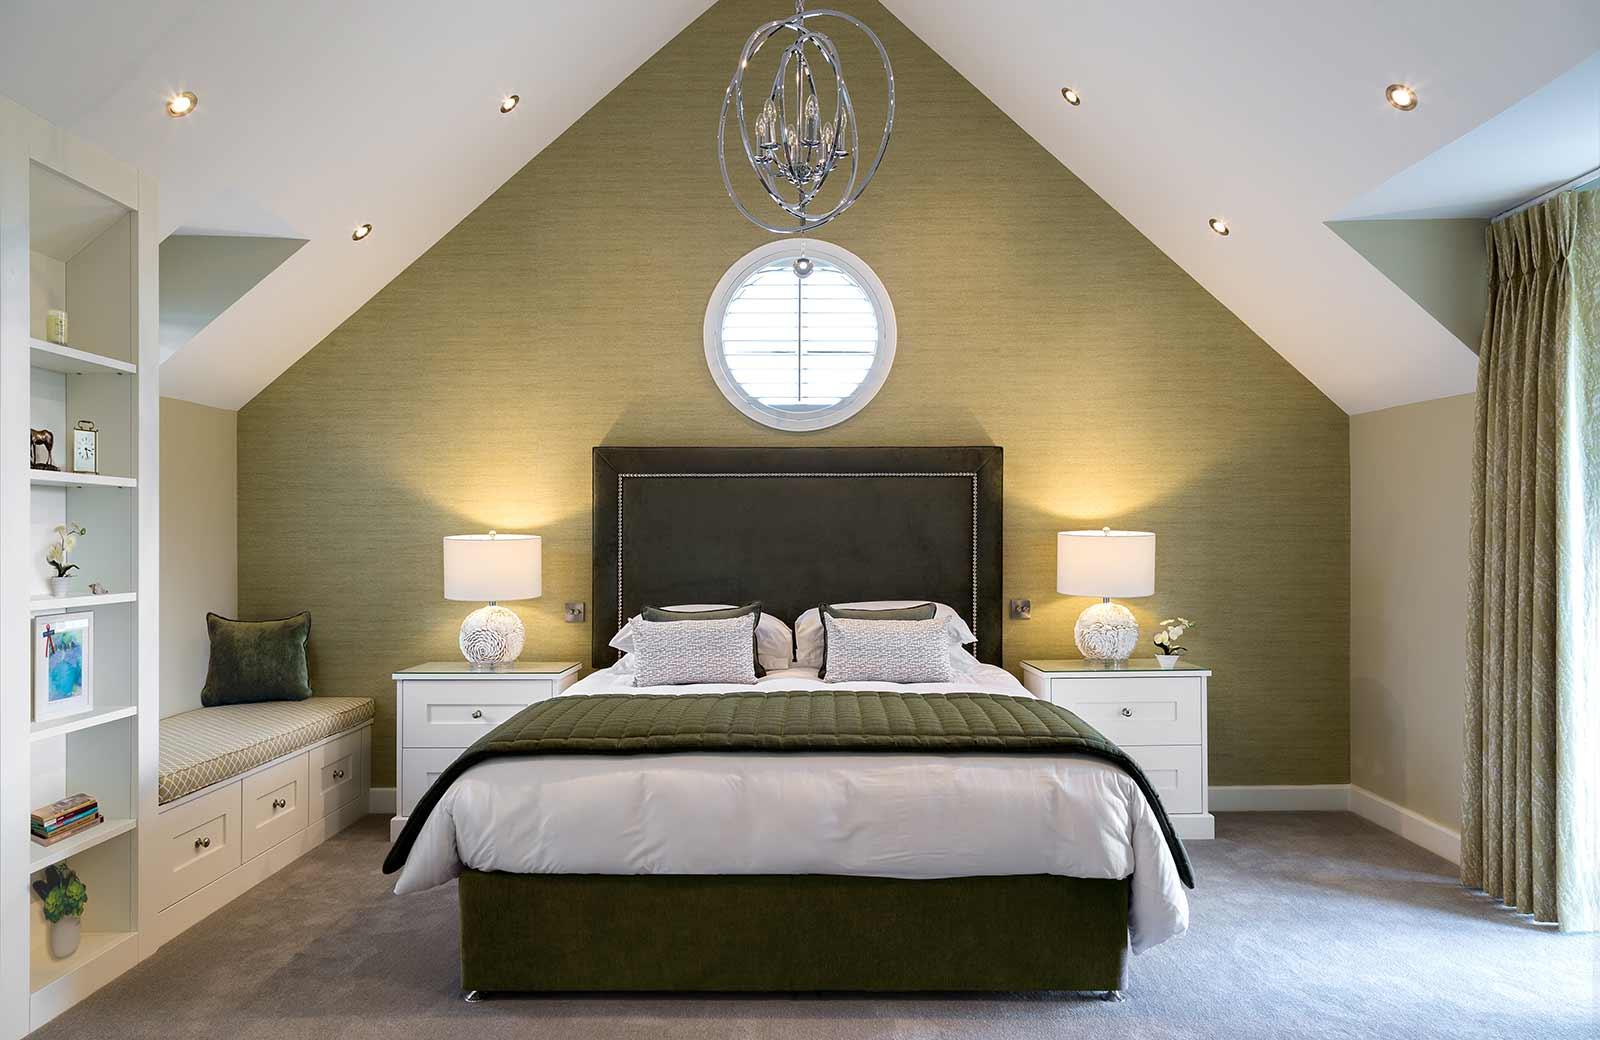 Carton-Interiors_P7_11_Bedroom